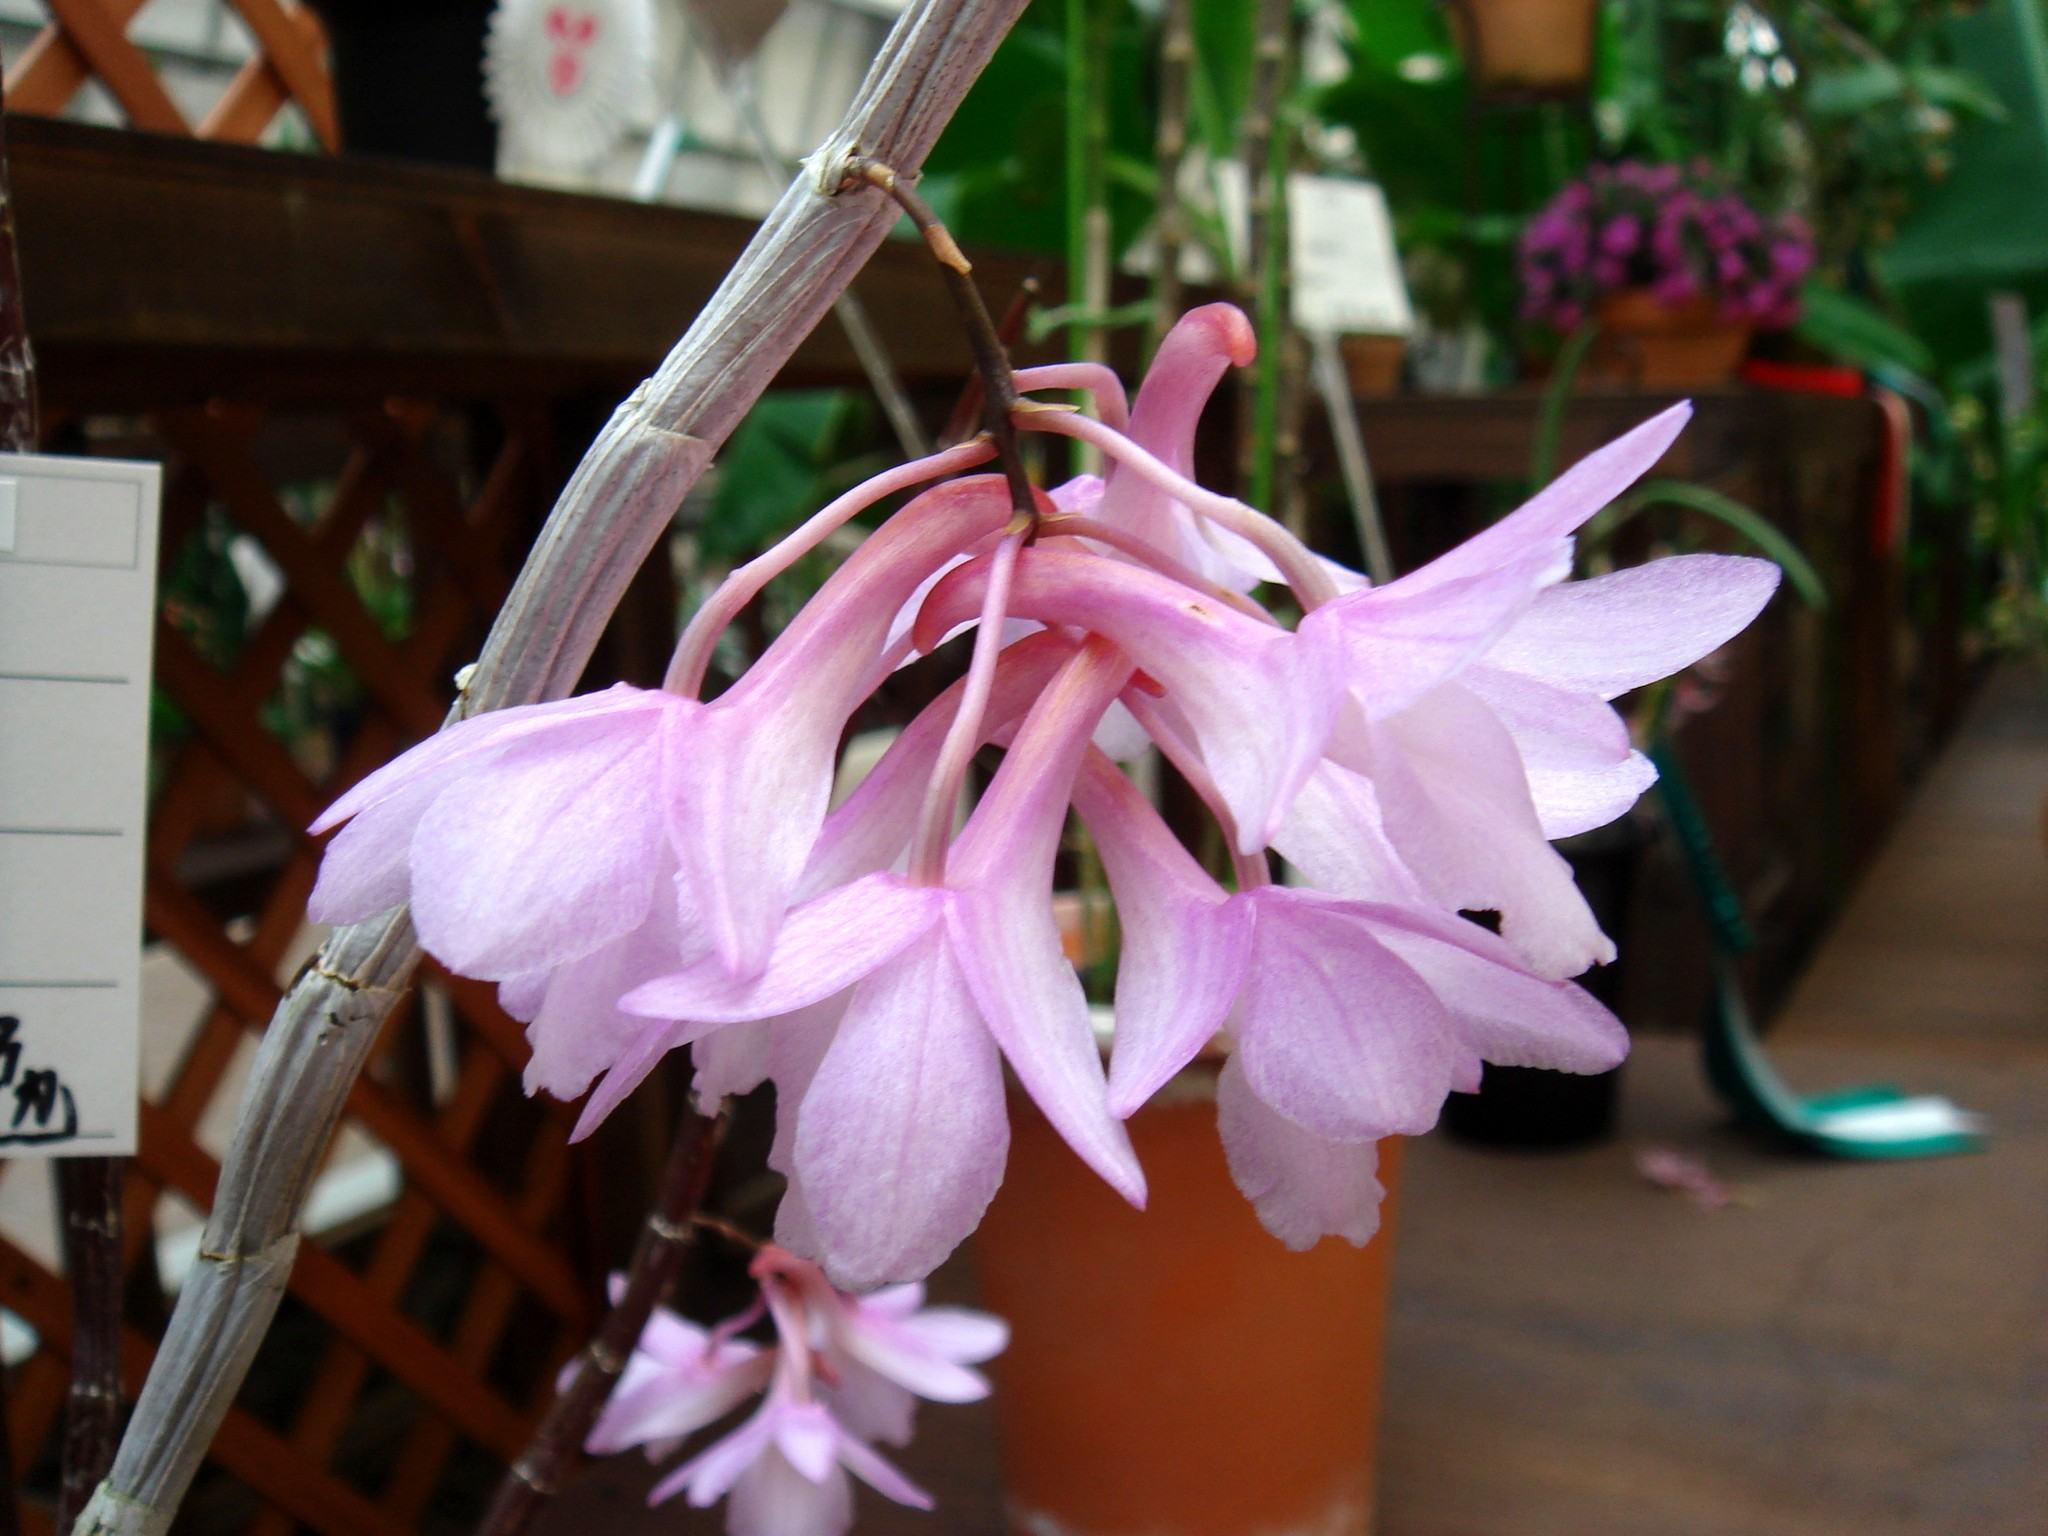 http://orchids.la.coocan.jp/Dendrobium/Dendrobium%20cumulatum/DSC03835.JPG